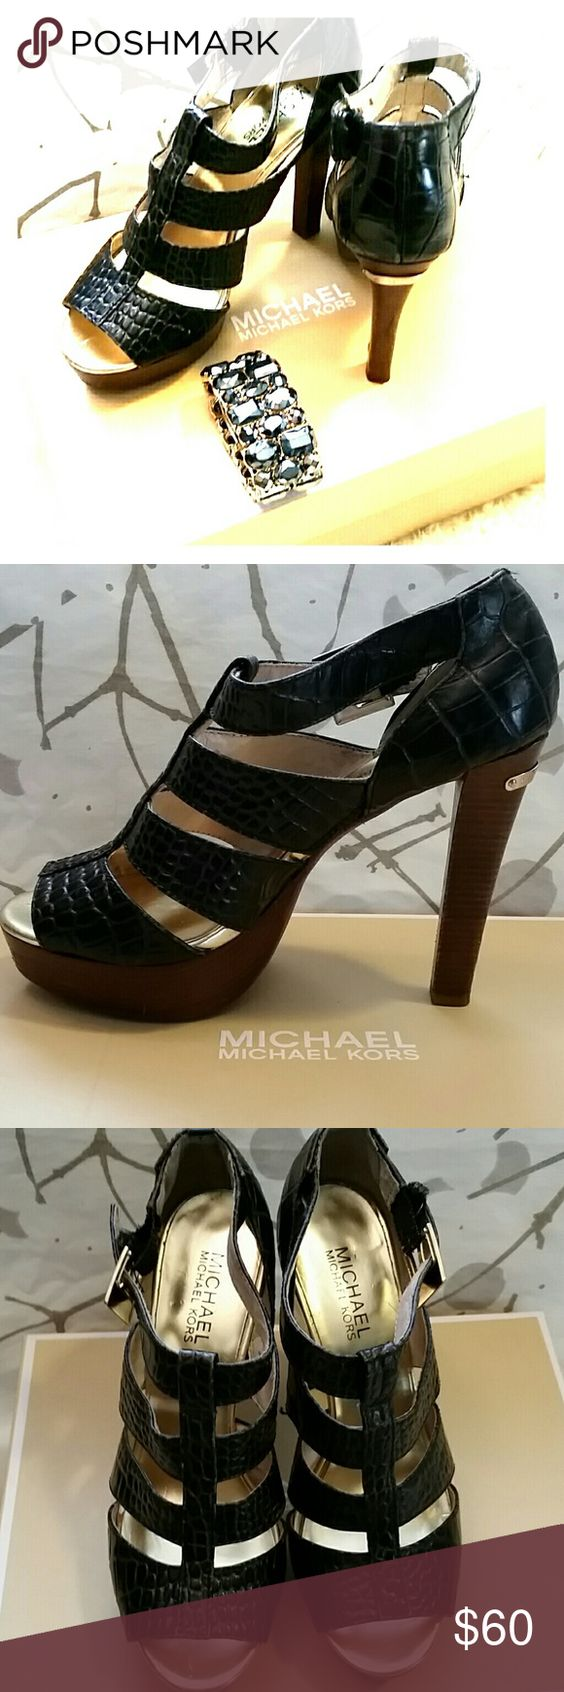 Black Michael Kors heels Black 3 inch Michael Kors heels, in nice condition, very comfortable fit MICHAEL Michael Kors Shoes Heels